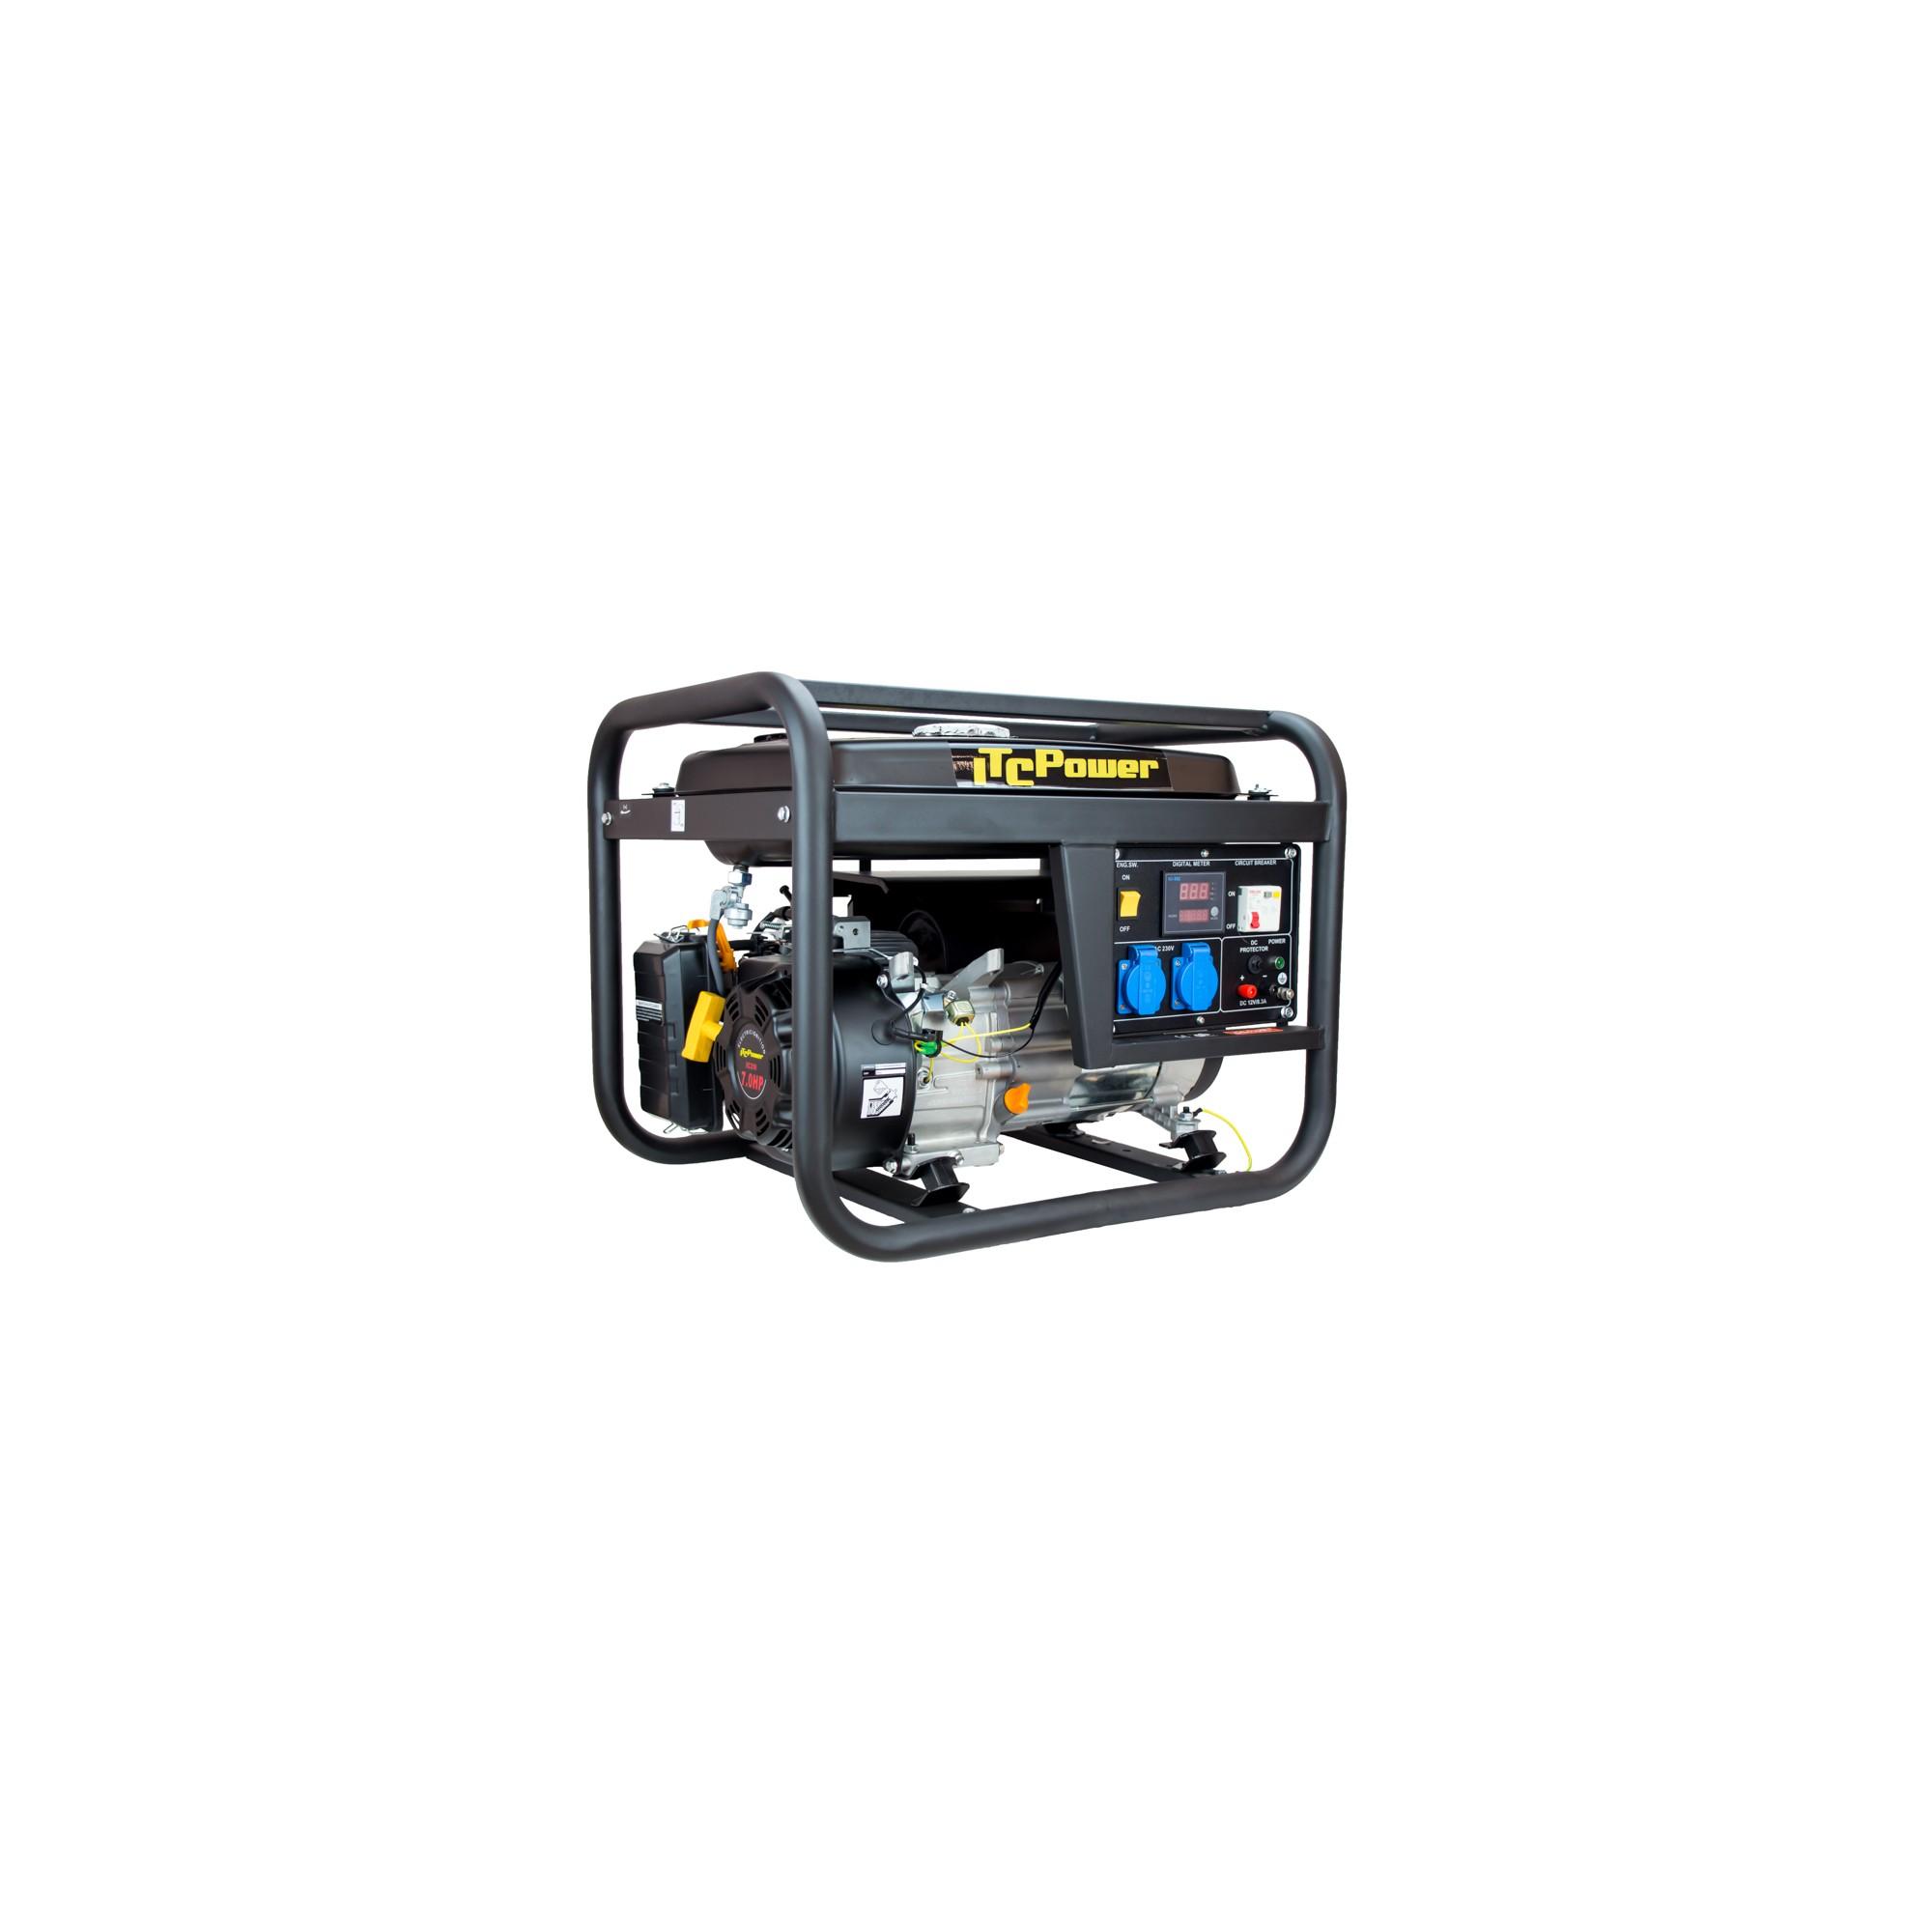 ITC POWER 3.200 Watt Benzin GG4100L Stromaggregat